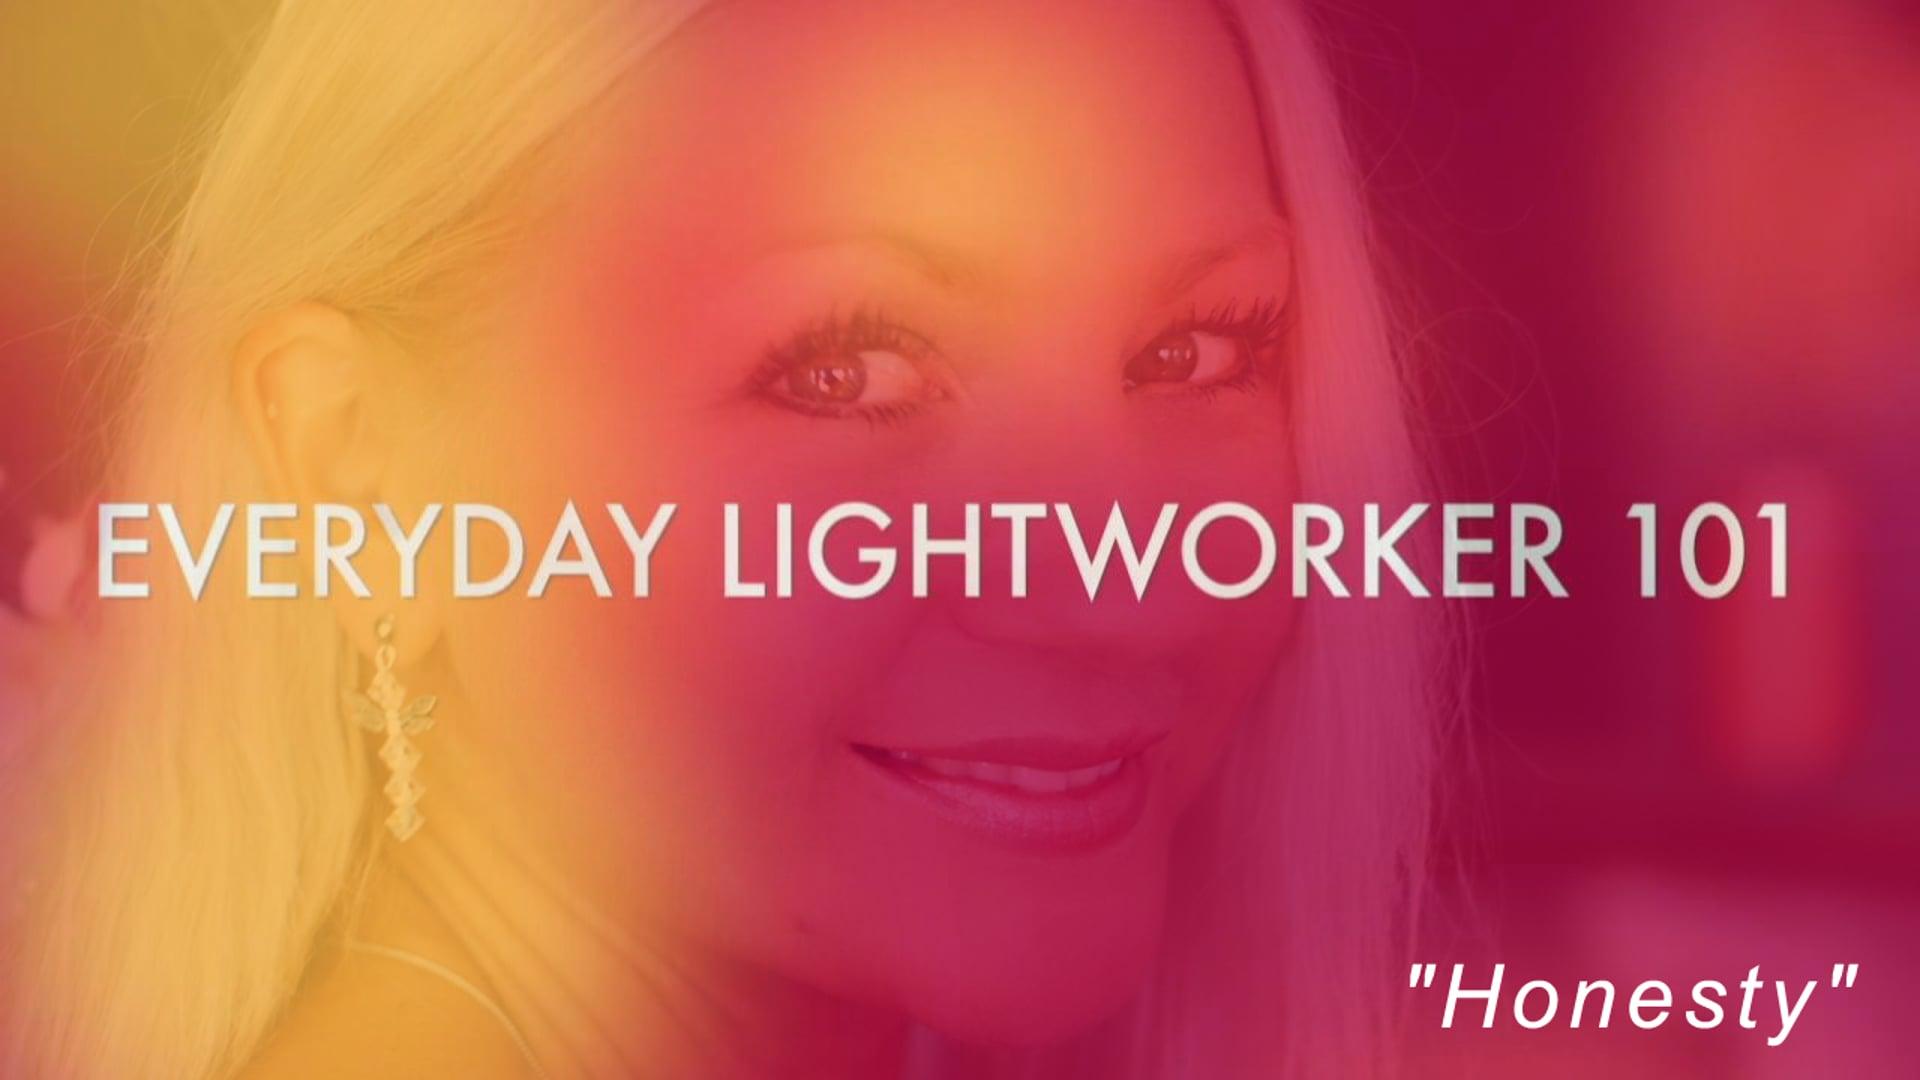 Everyday Lightworker 101: Honesty